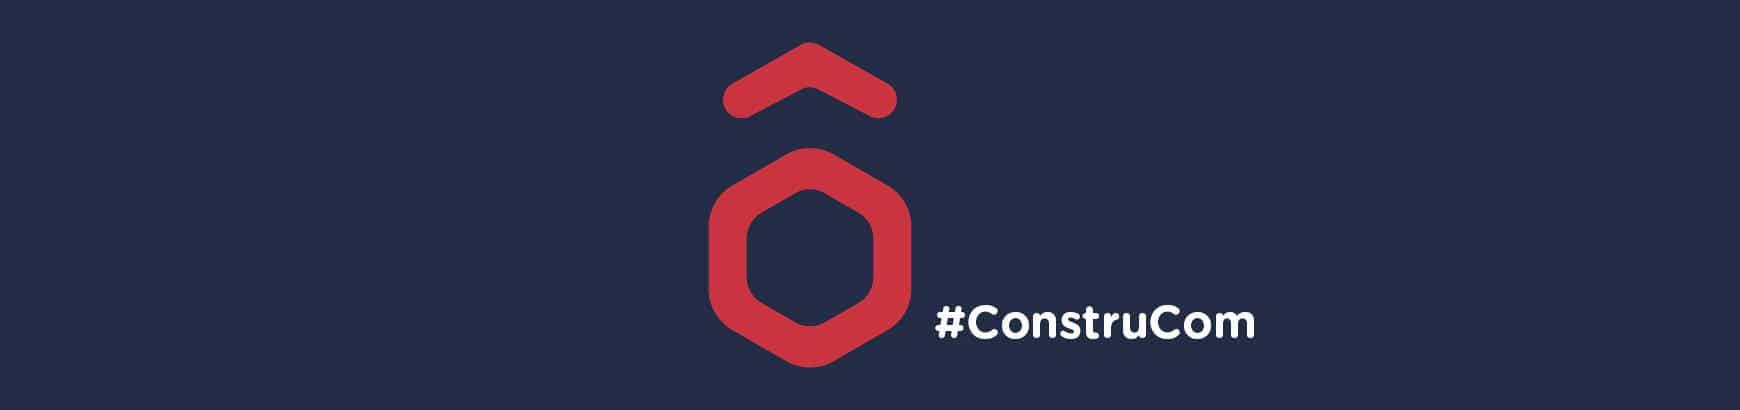 ConstruCom | Interview Loïc Vandromme